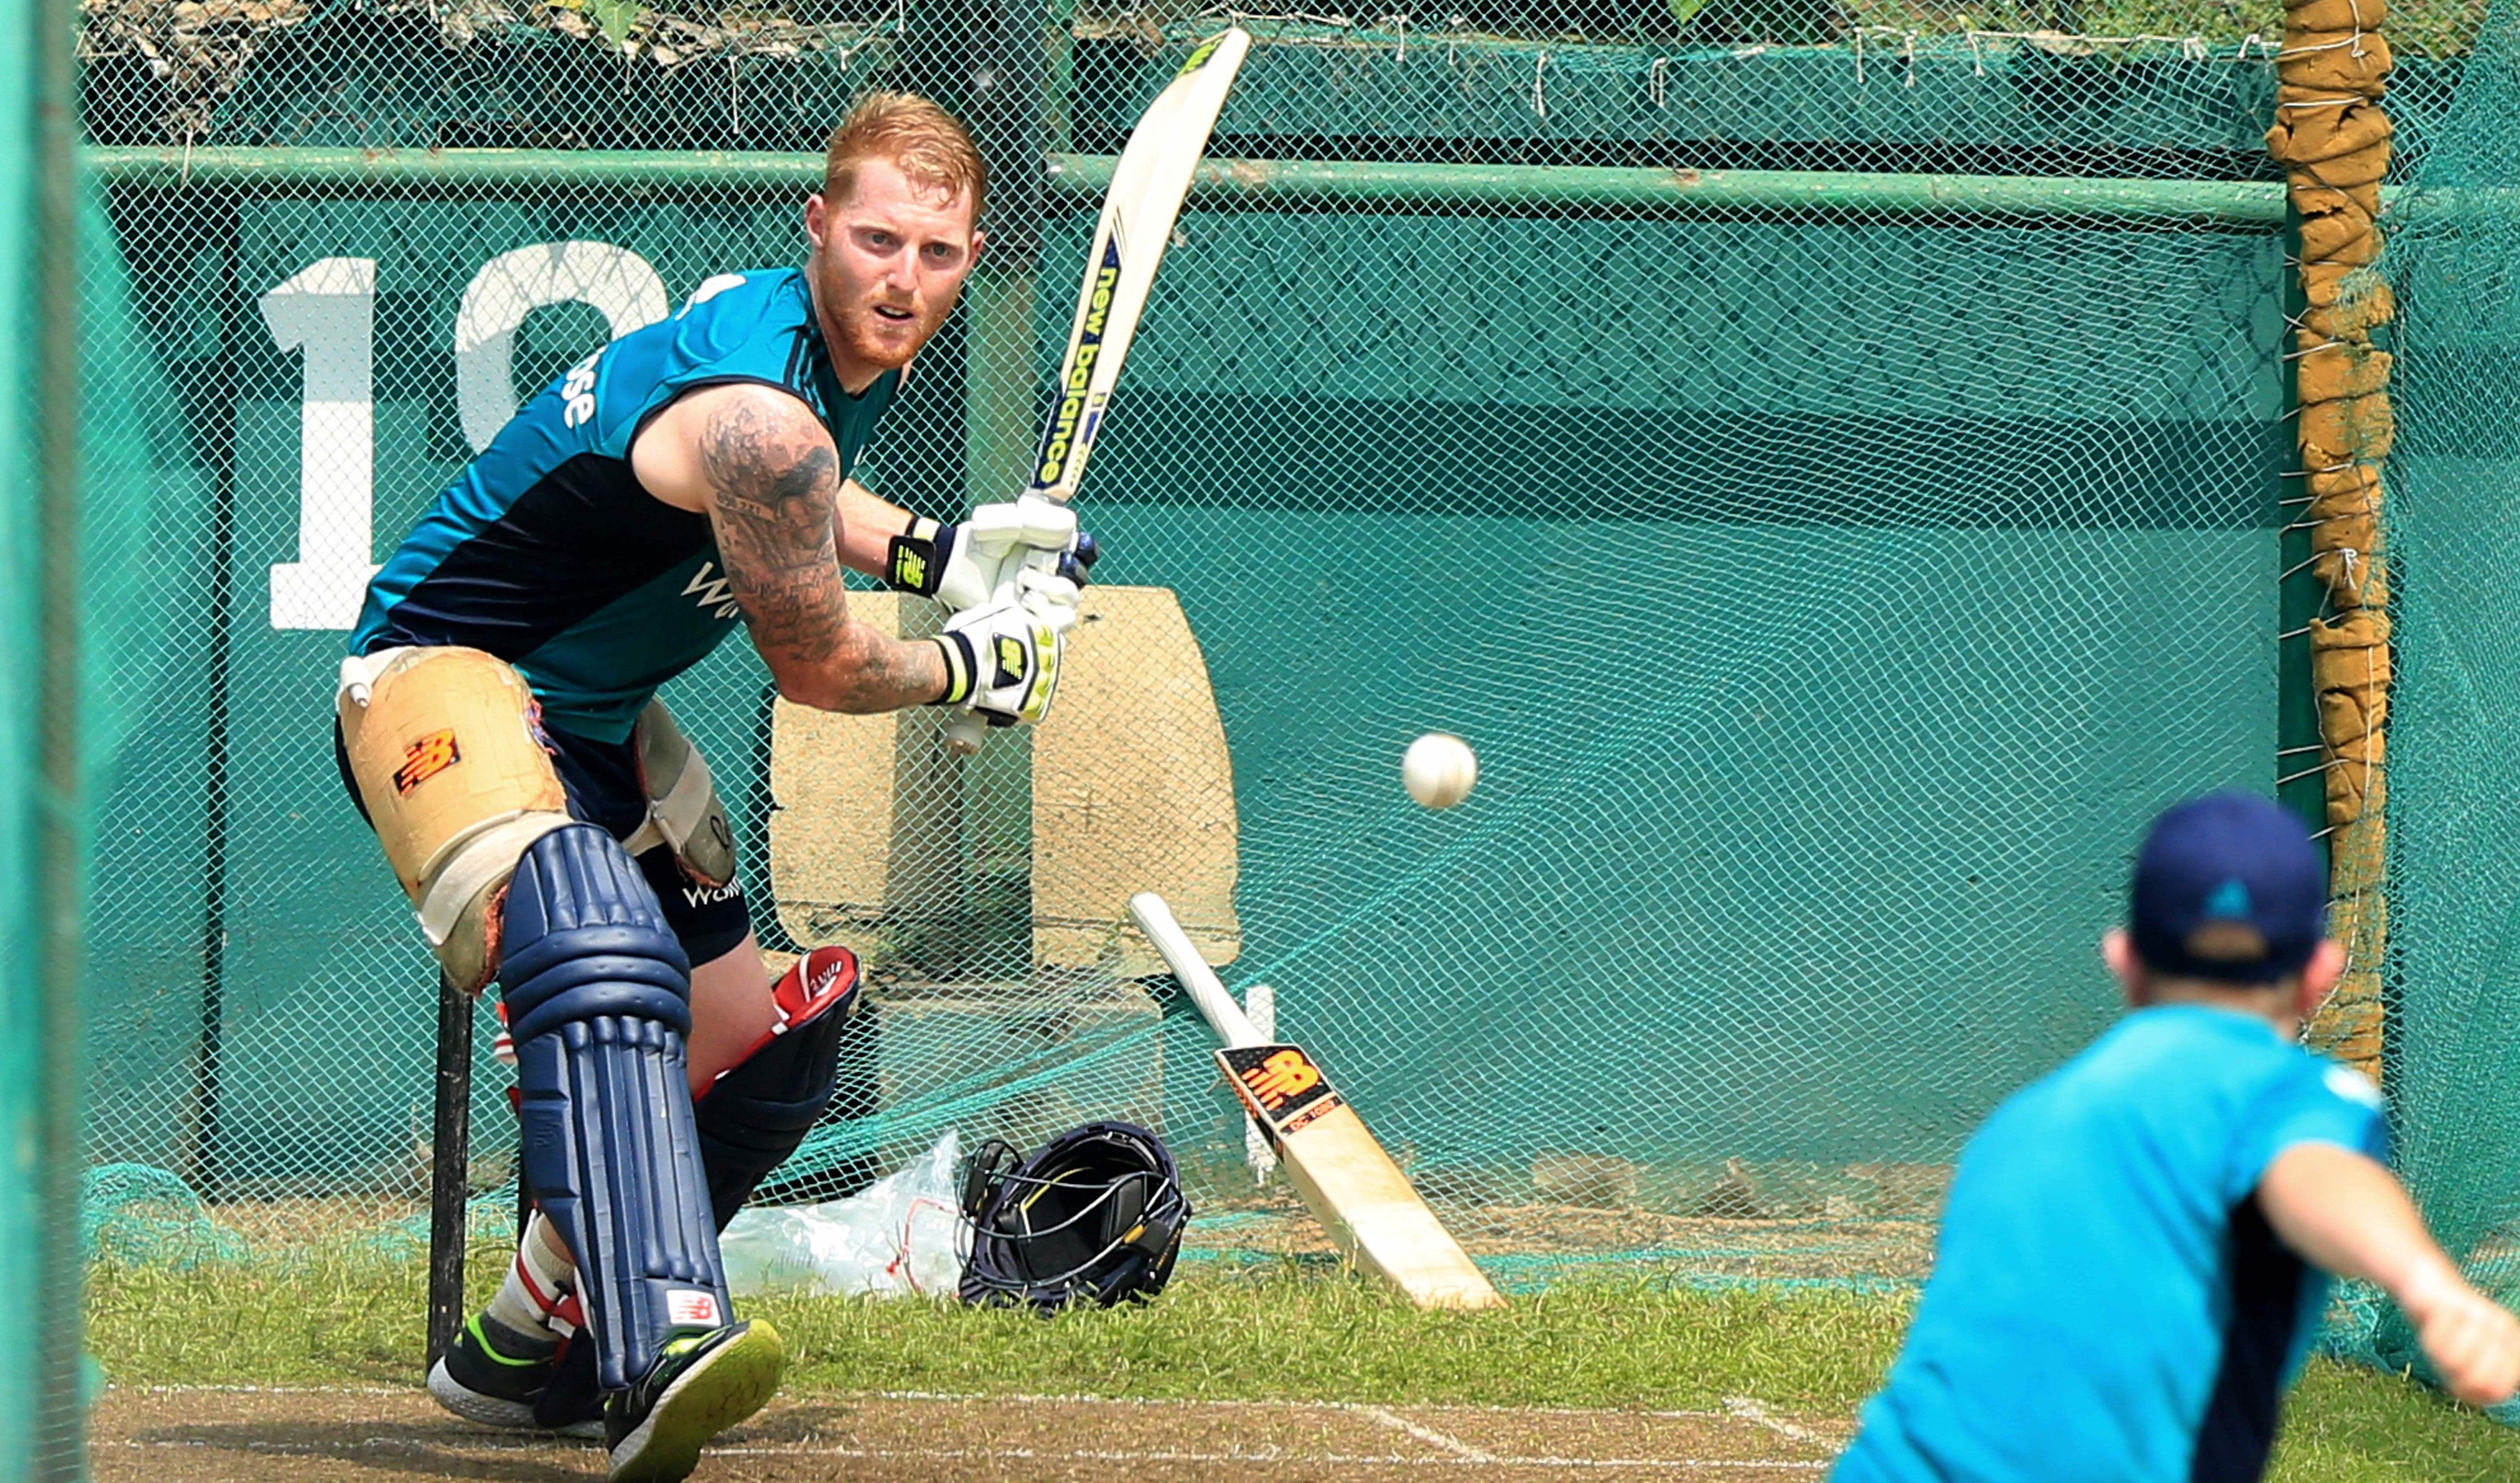 Bangladesh cricket, England cricket, live stream, England World Cup defeat, Bangladesh terrorism, cricket, 1st ODI